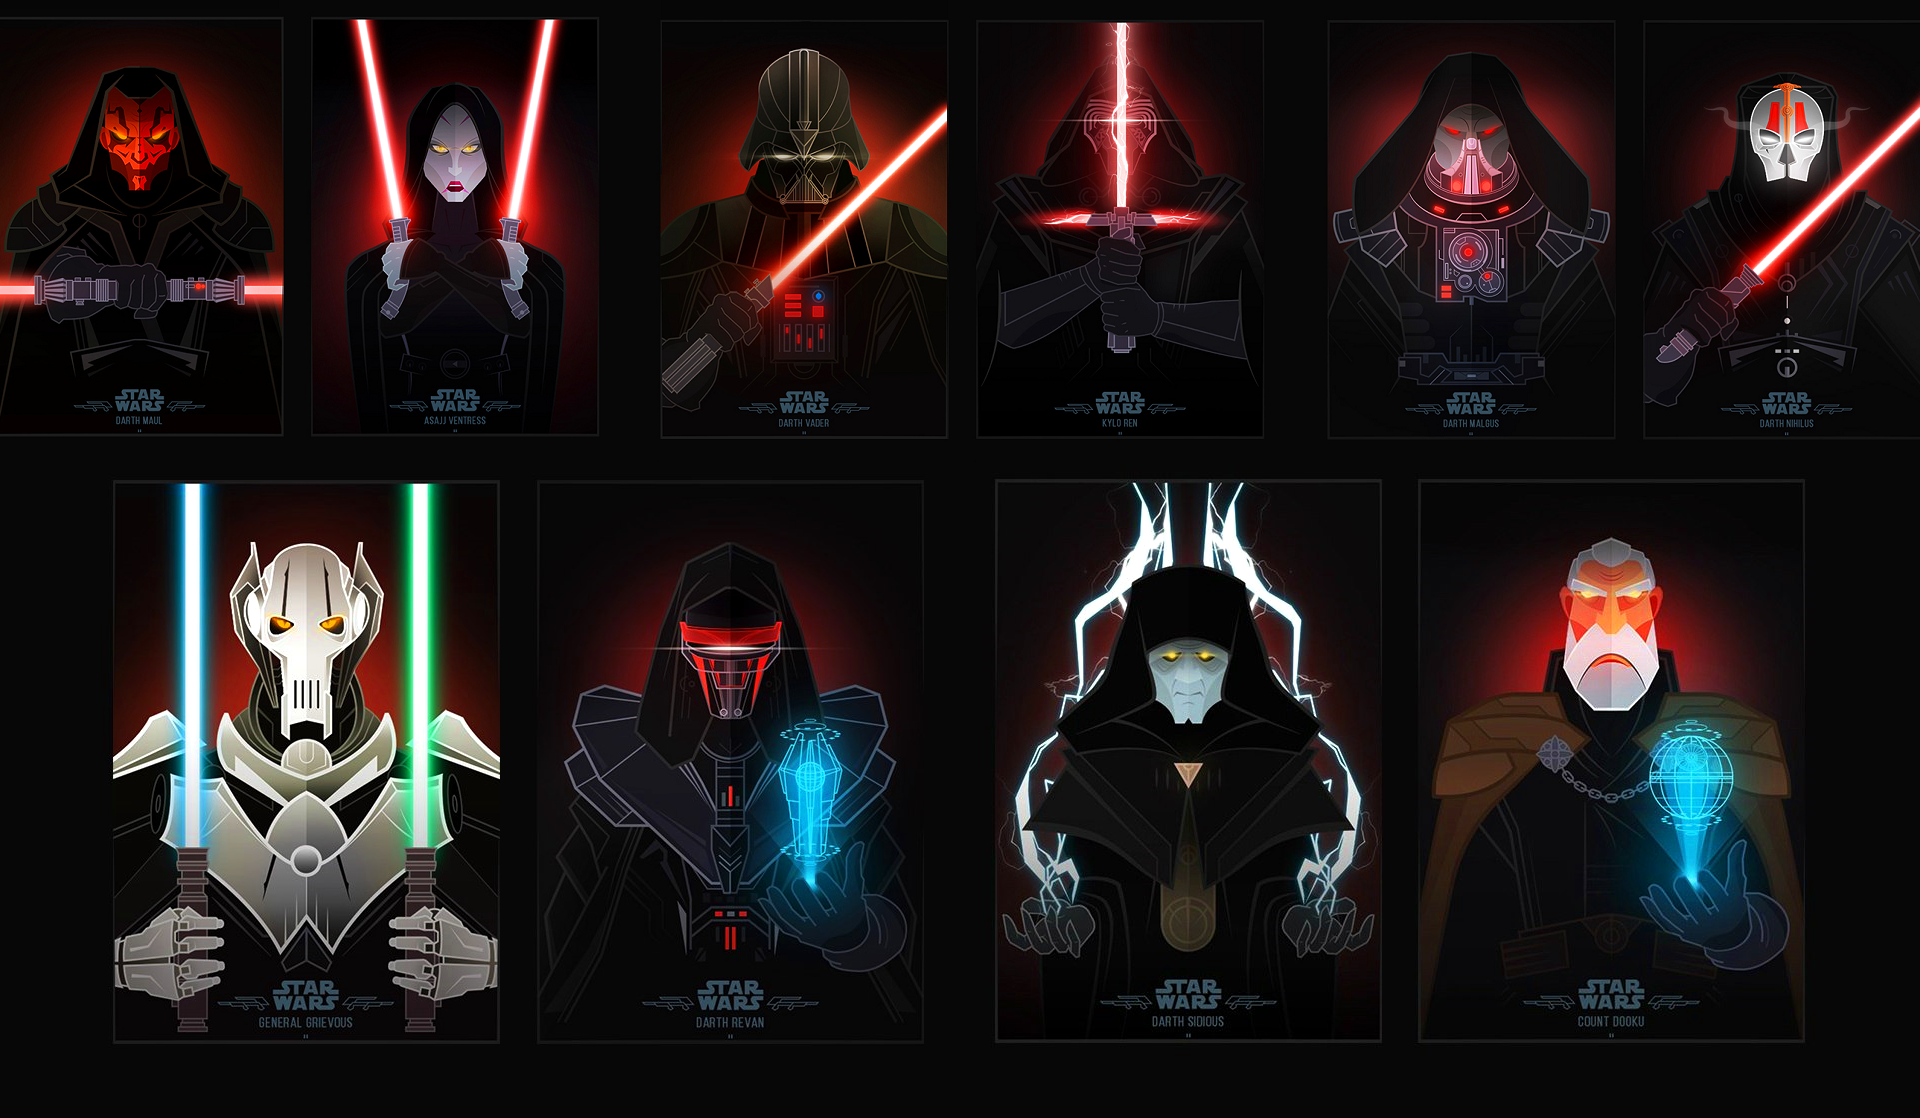 Star Wars Sith Wallpapers Hd Resolution Bozhuwallpaper